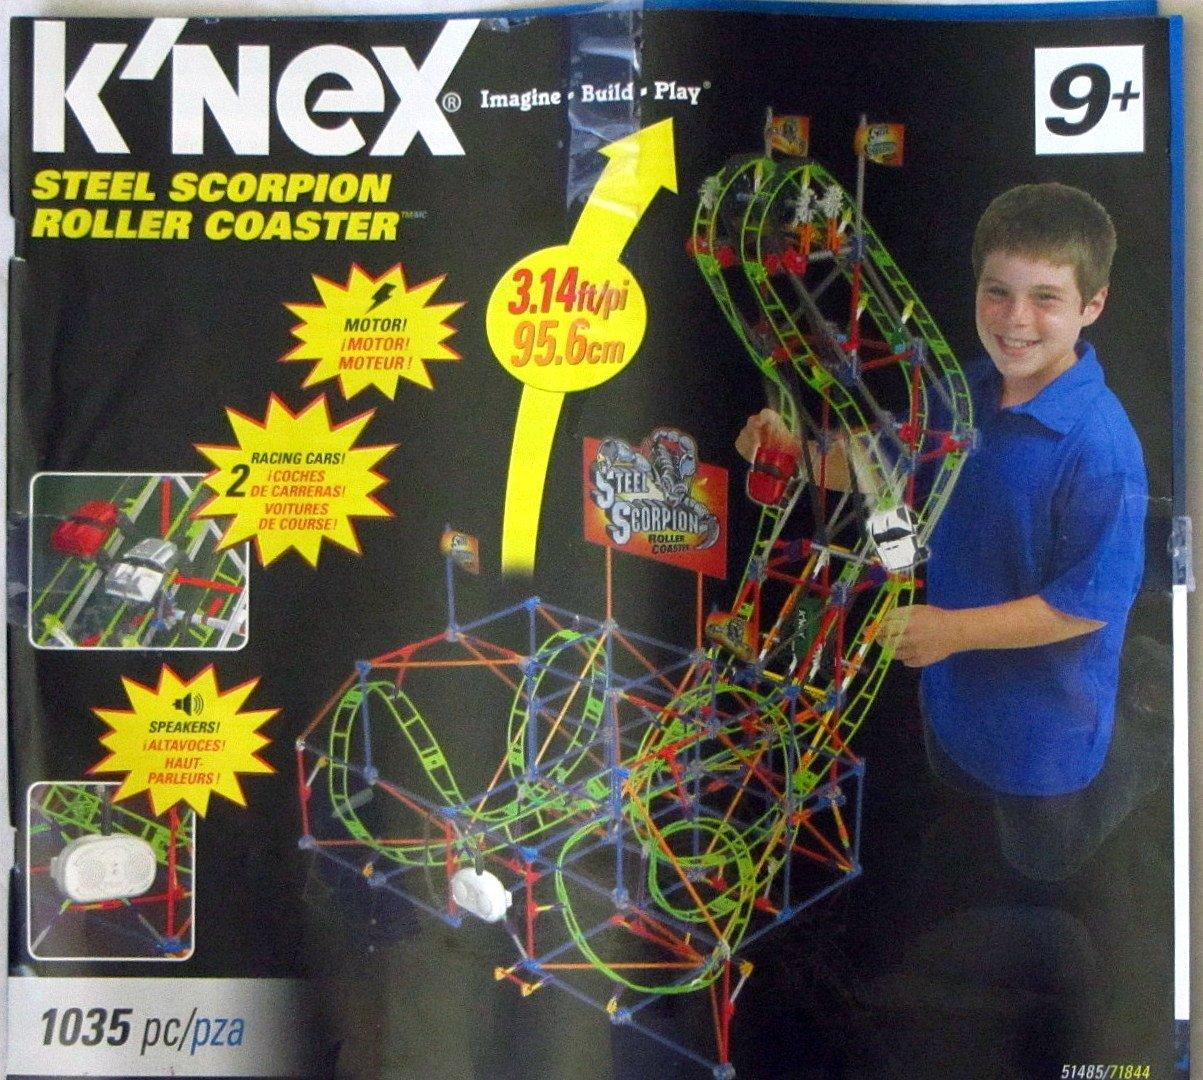 KNEX Steel Scorpion Roller Coaster